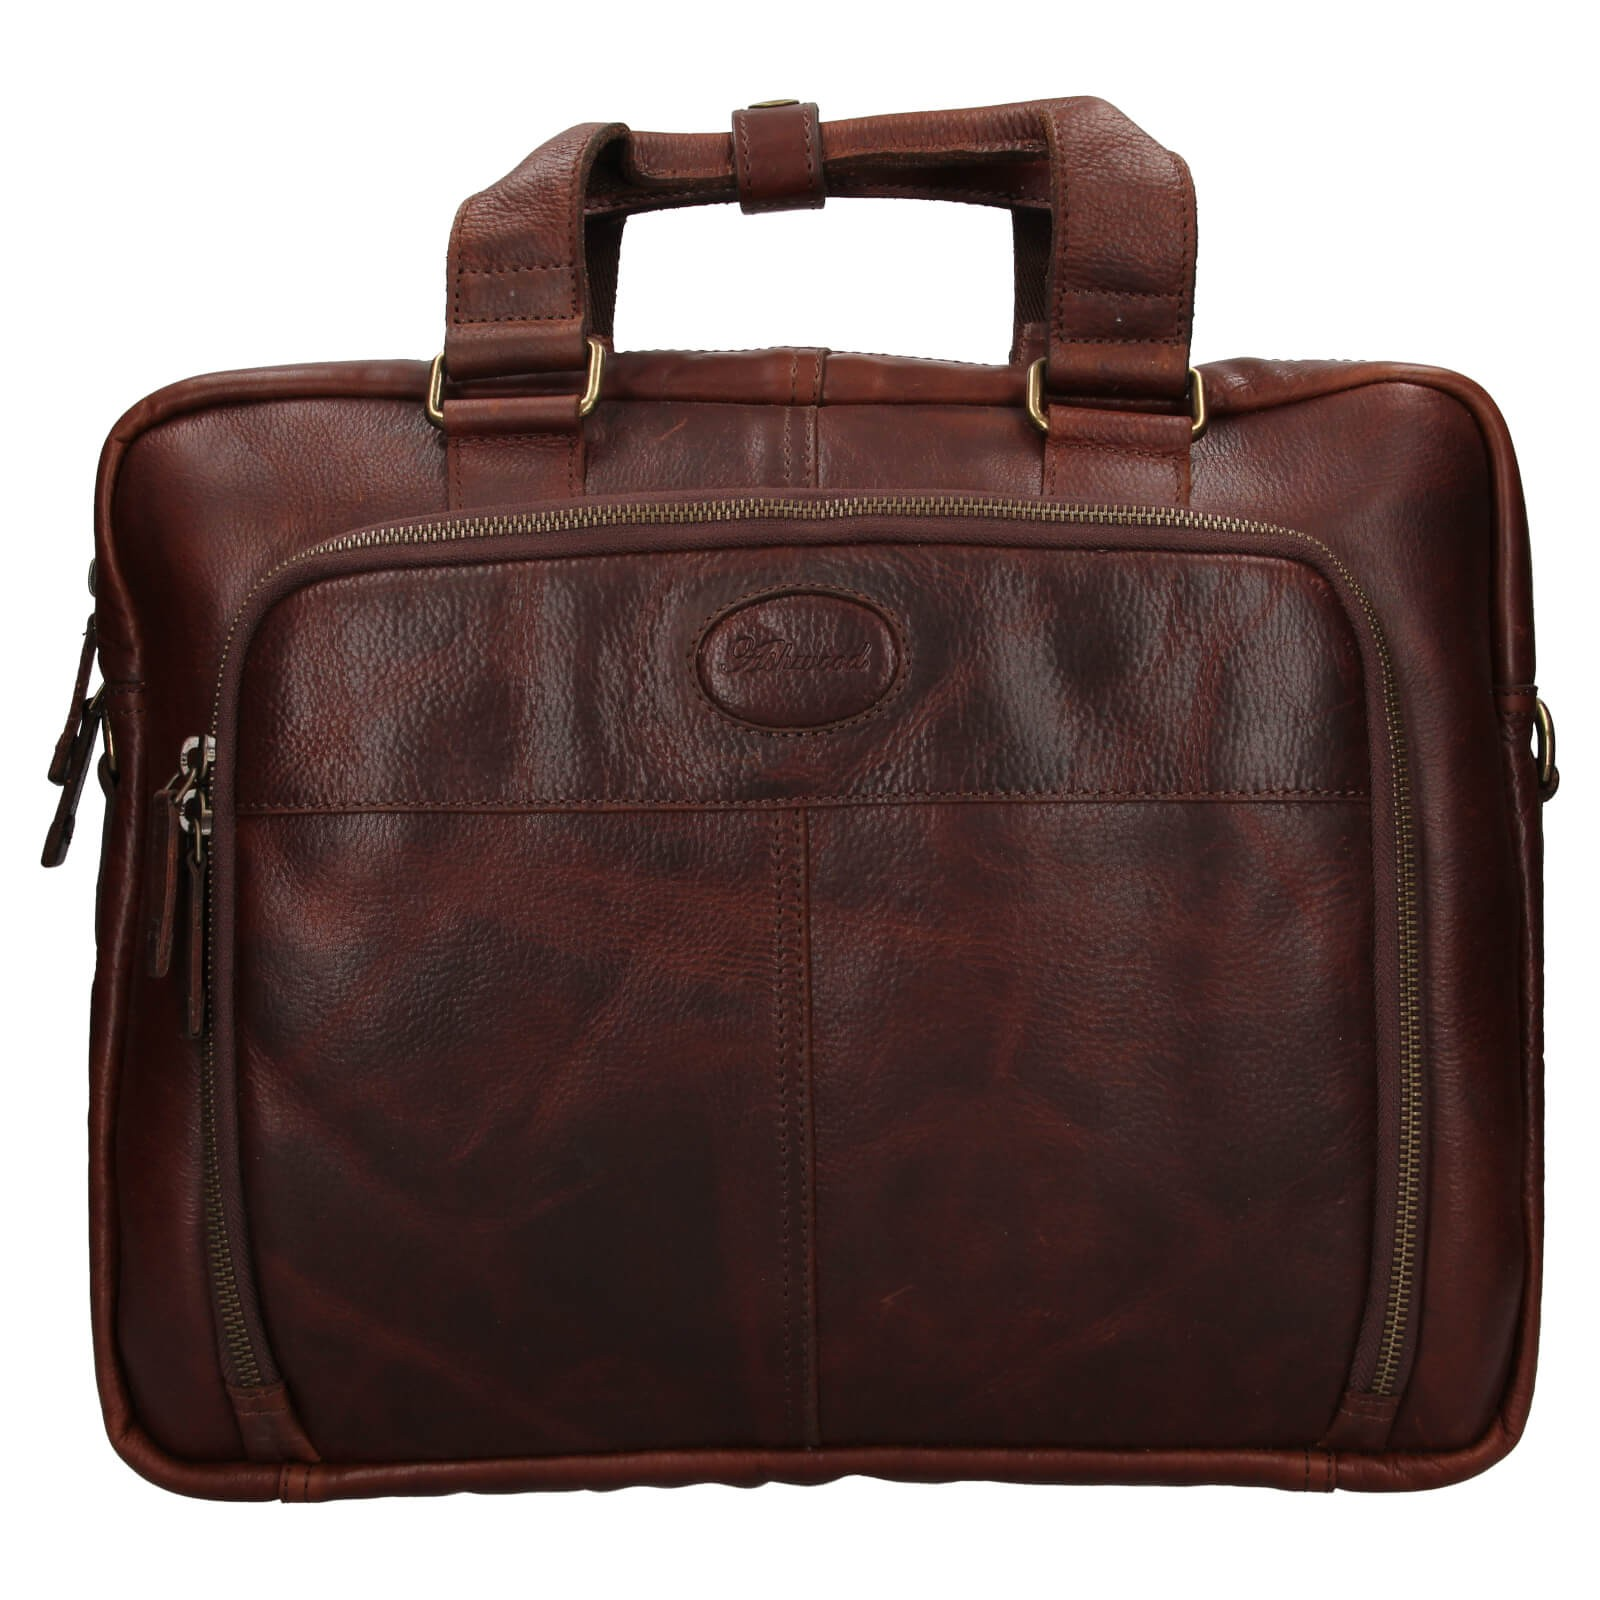 Pánska kožená taška na notebook Ashwood Bens - hnedá